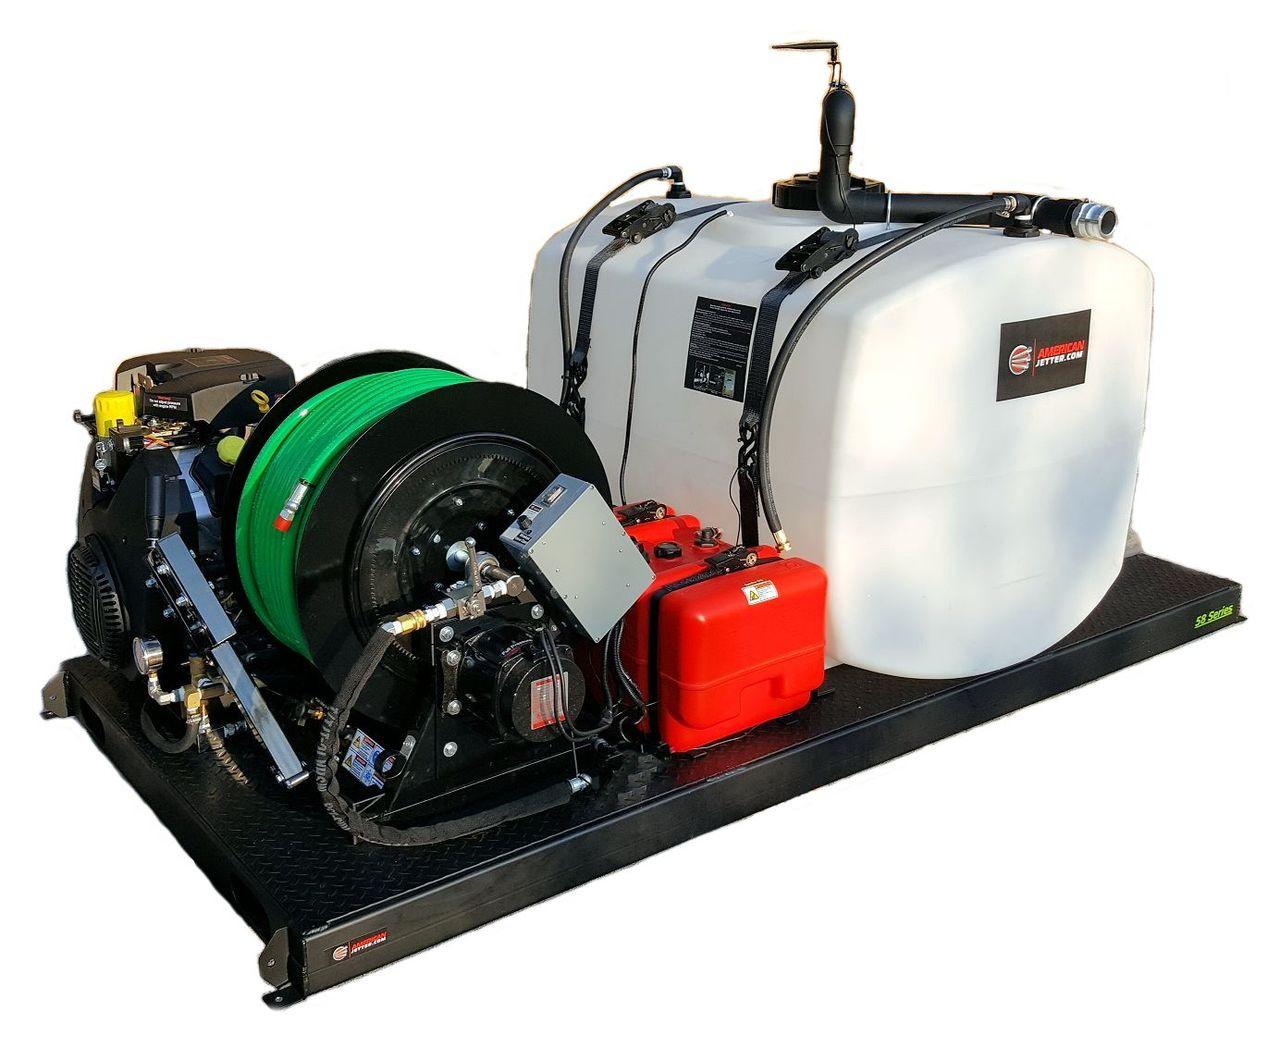 48 Series Skid Jetter 1140 - 37 HP, 11 GPM, 4000 PSI